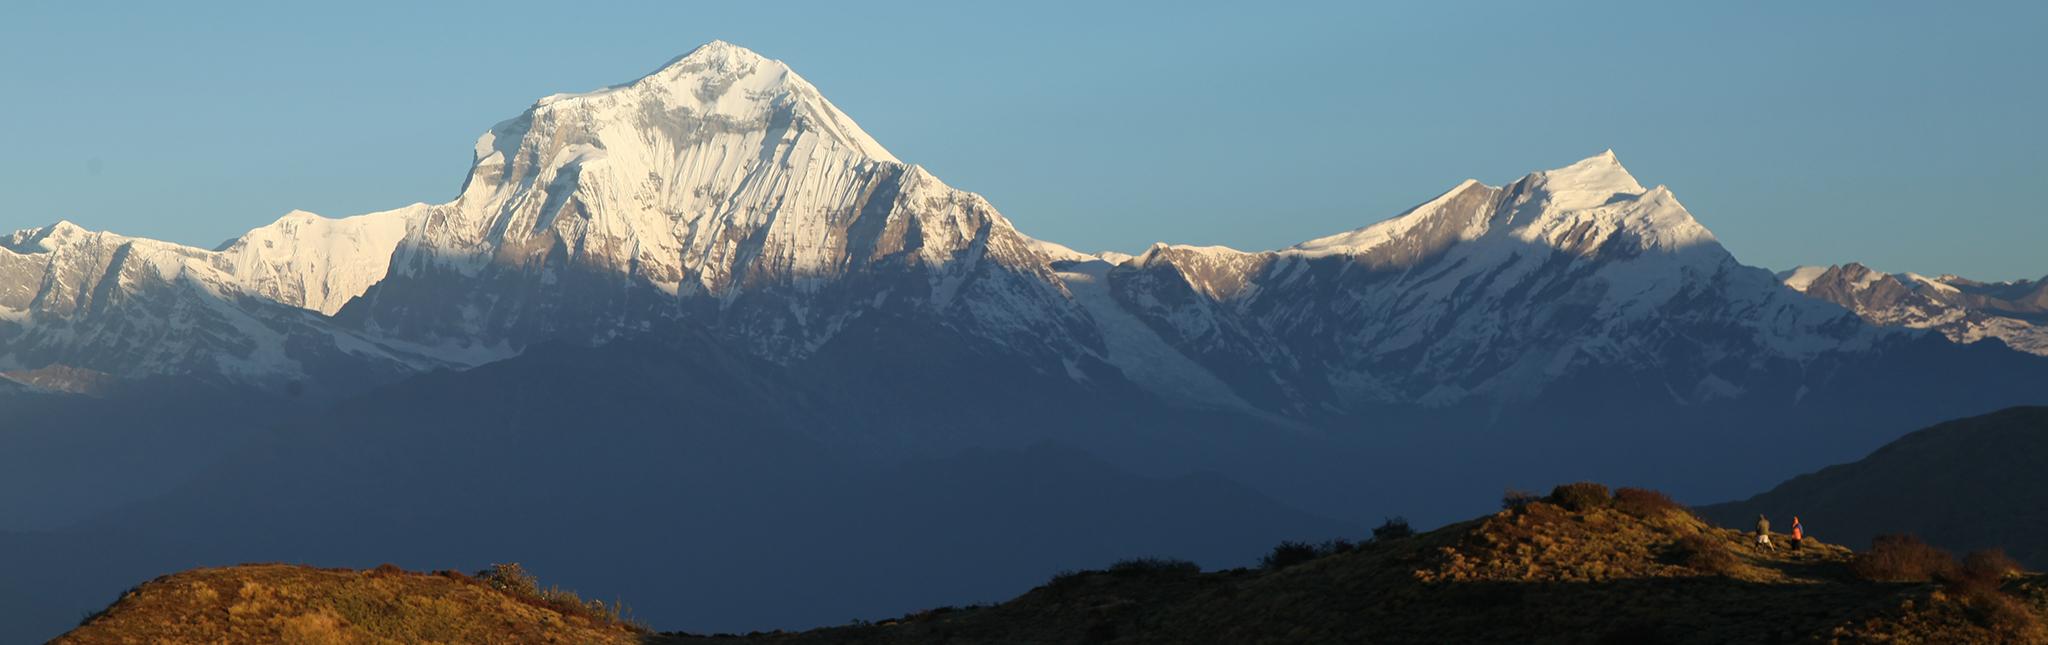 banner dhaulagiri